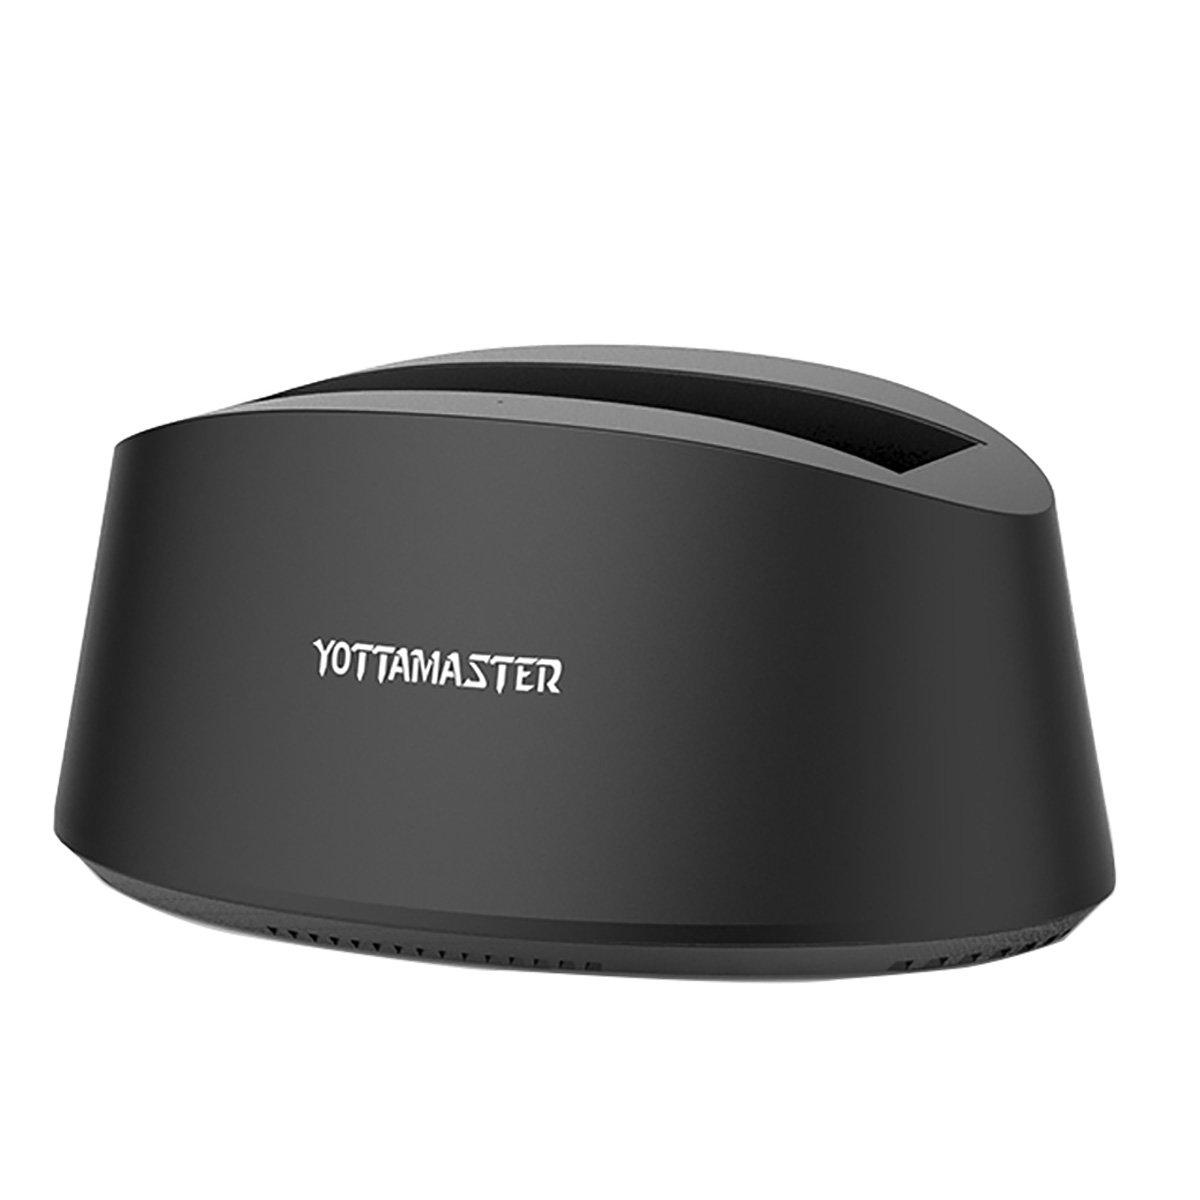 [ 10TB y UASP ] Yottamaster Base de Conexió n Docking Station USB 3.0 para SATA HDD/SSD Windows/Mac/Linux Yottamaster Technology Co. Ltd. Yottamaster K100U3-BK-DE